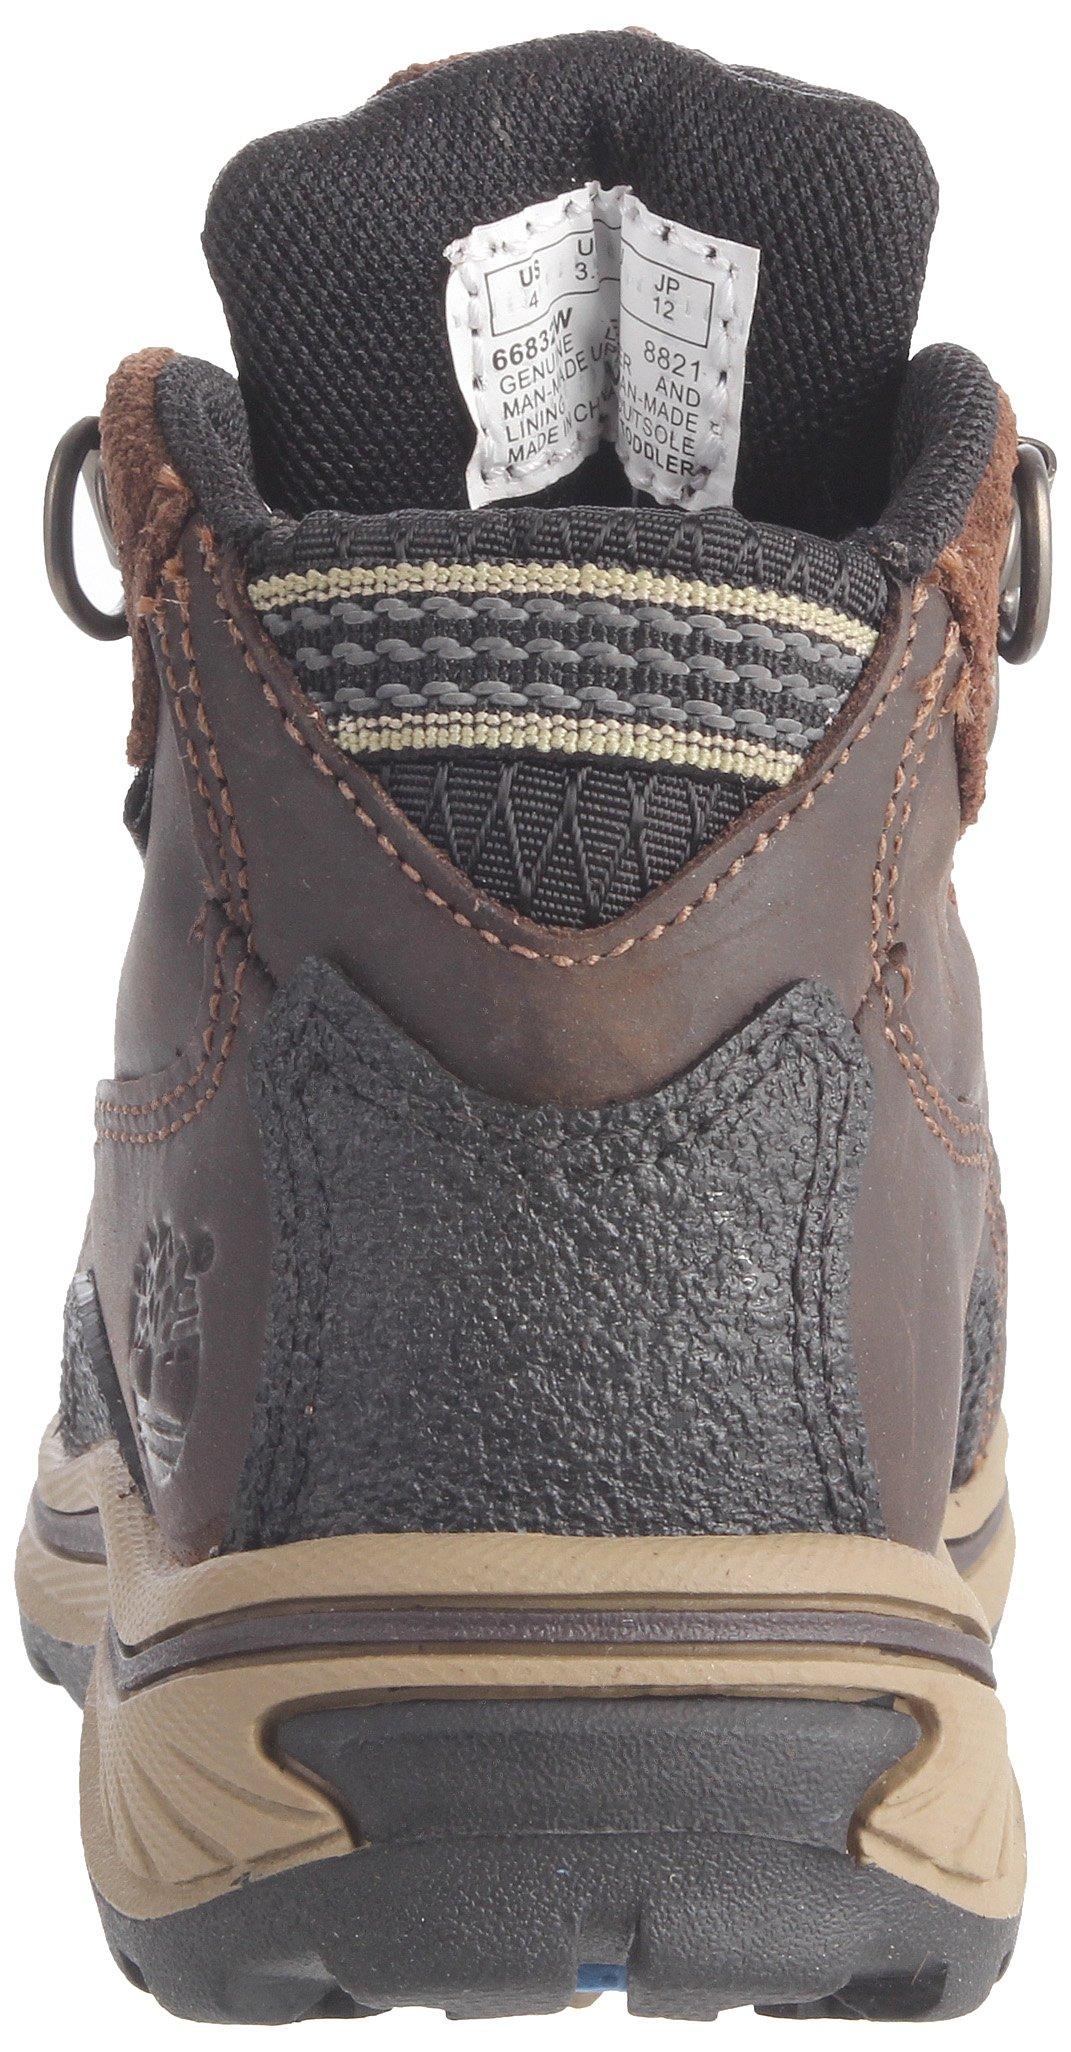 Timberland Pawtuckaway, Unisex-Child Hiking Shoes 2